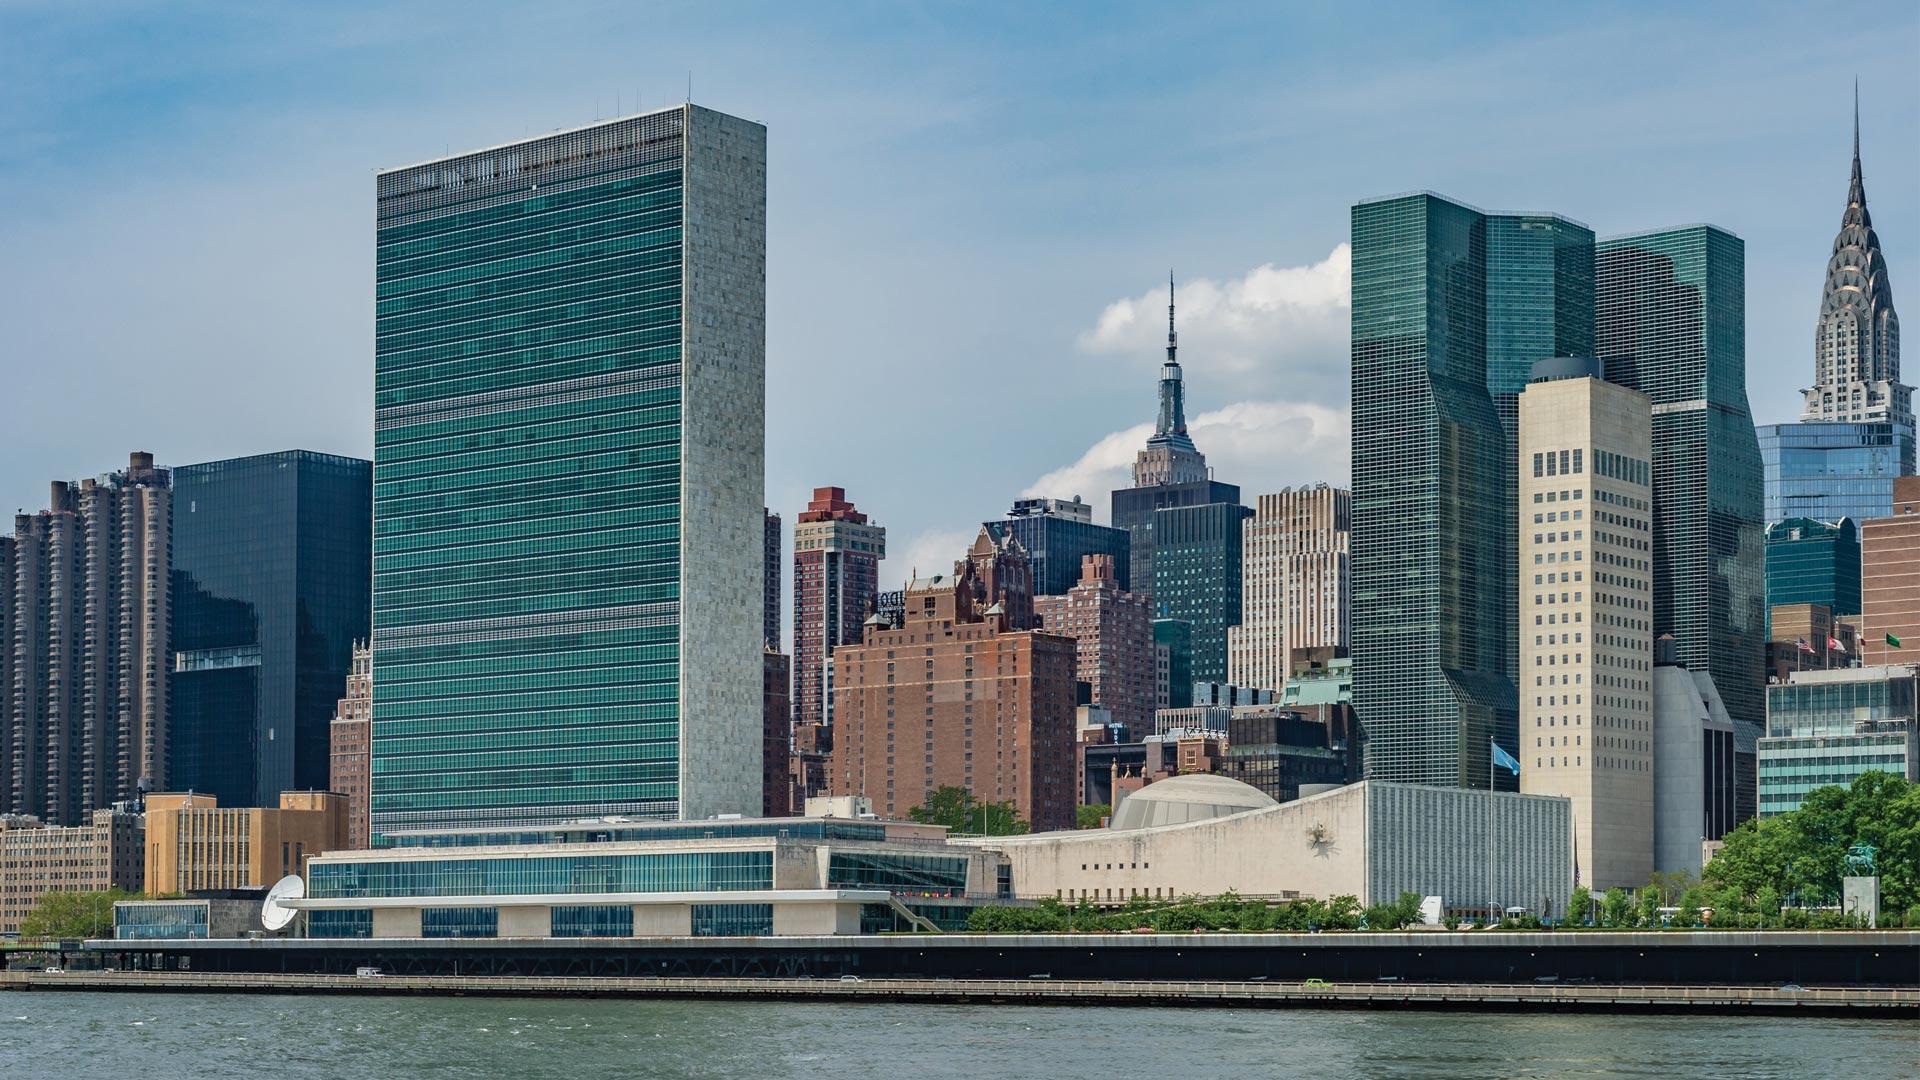 UN Building New York City